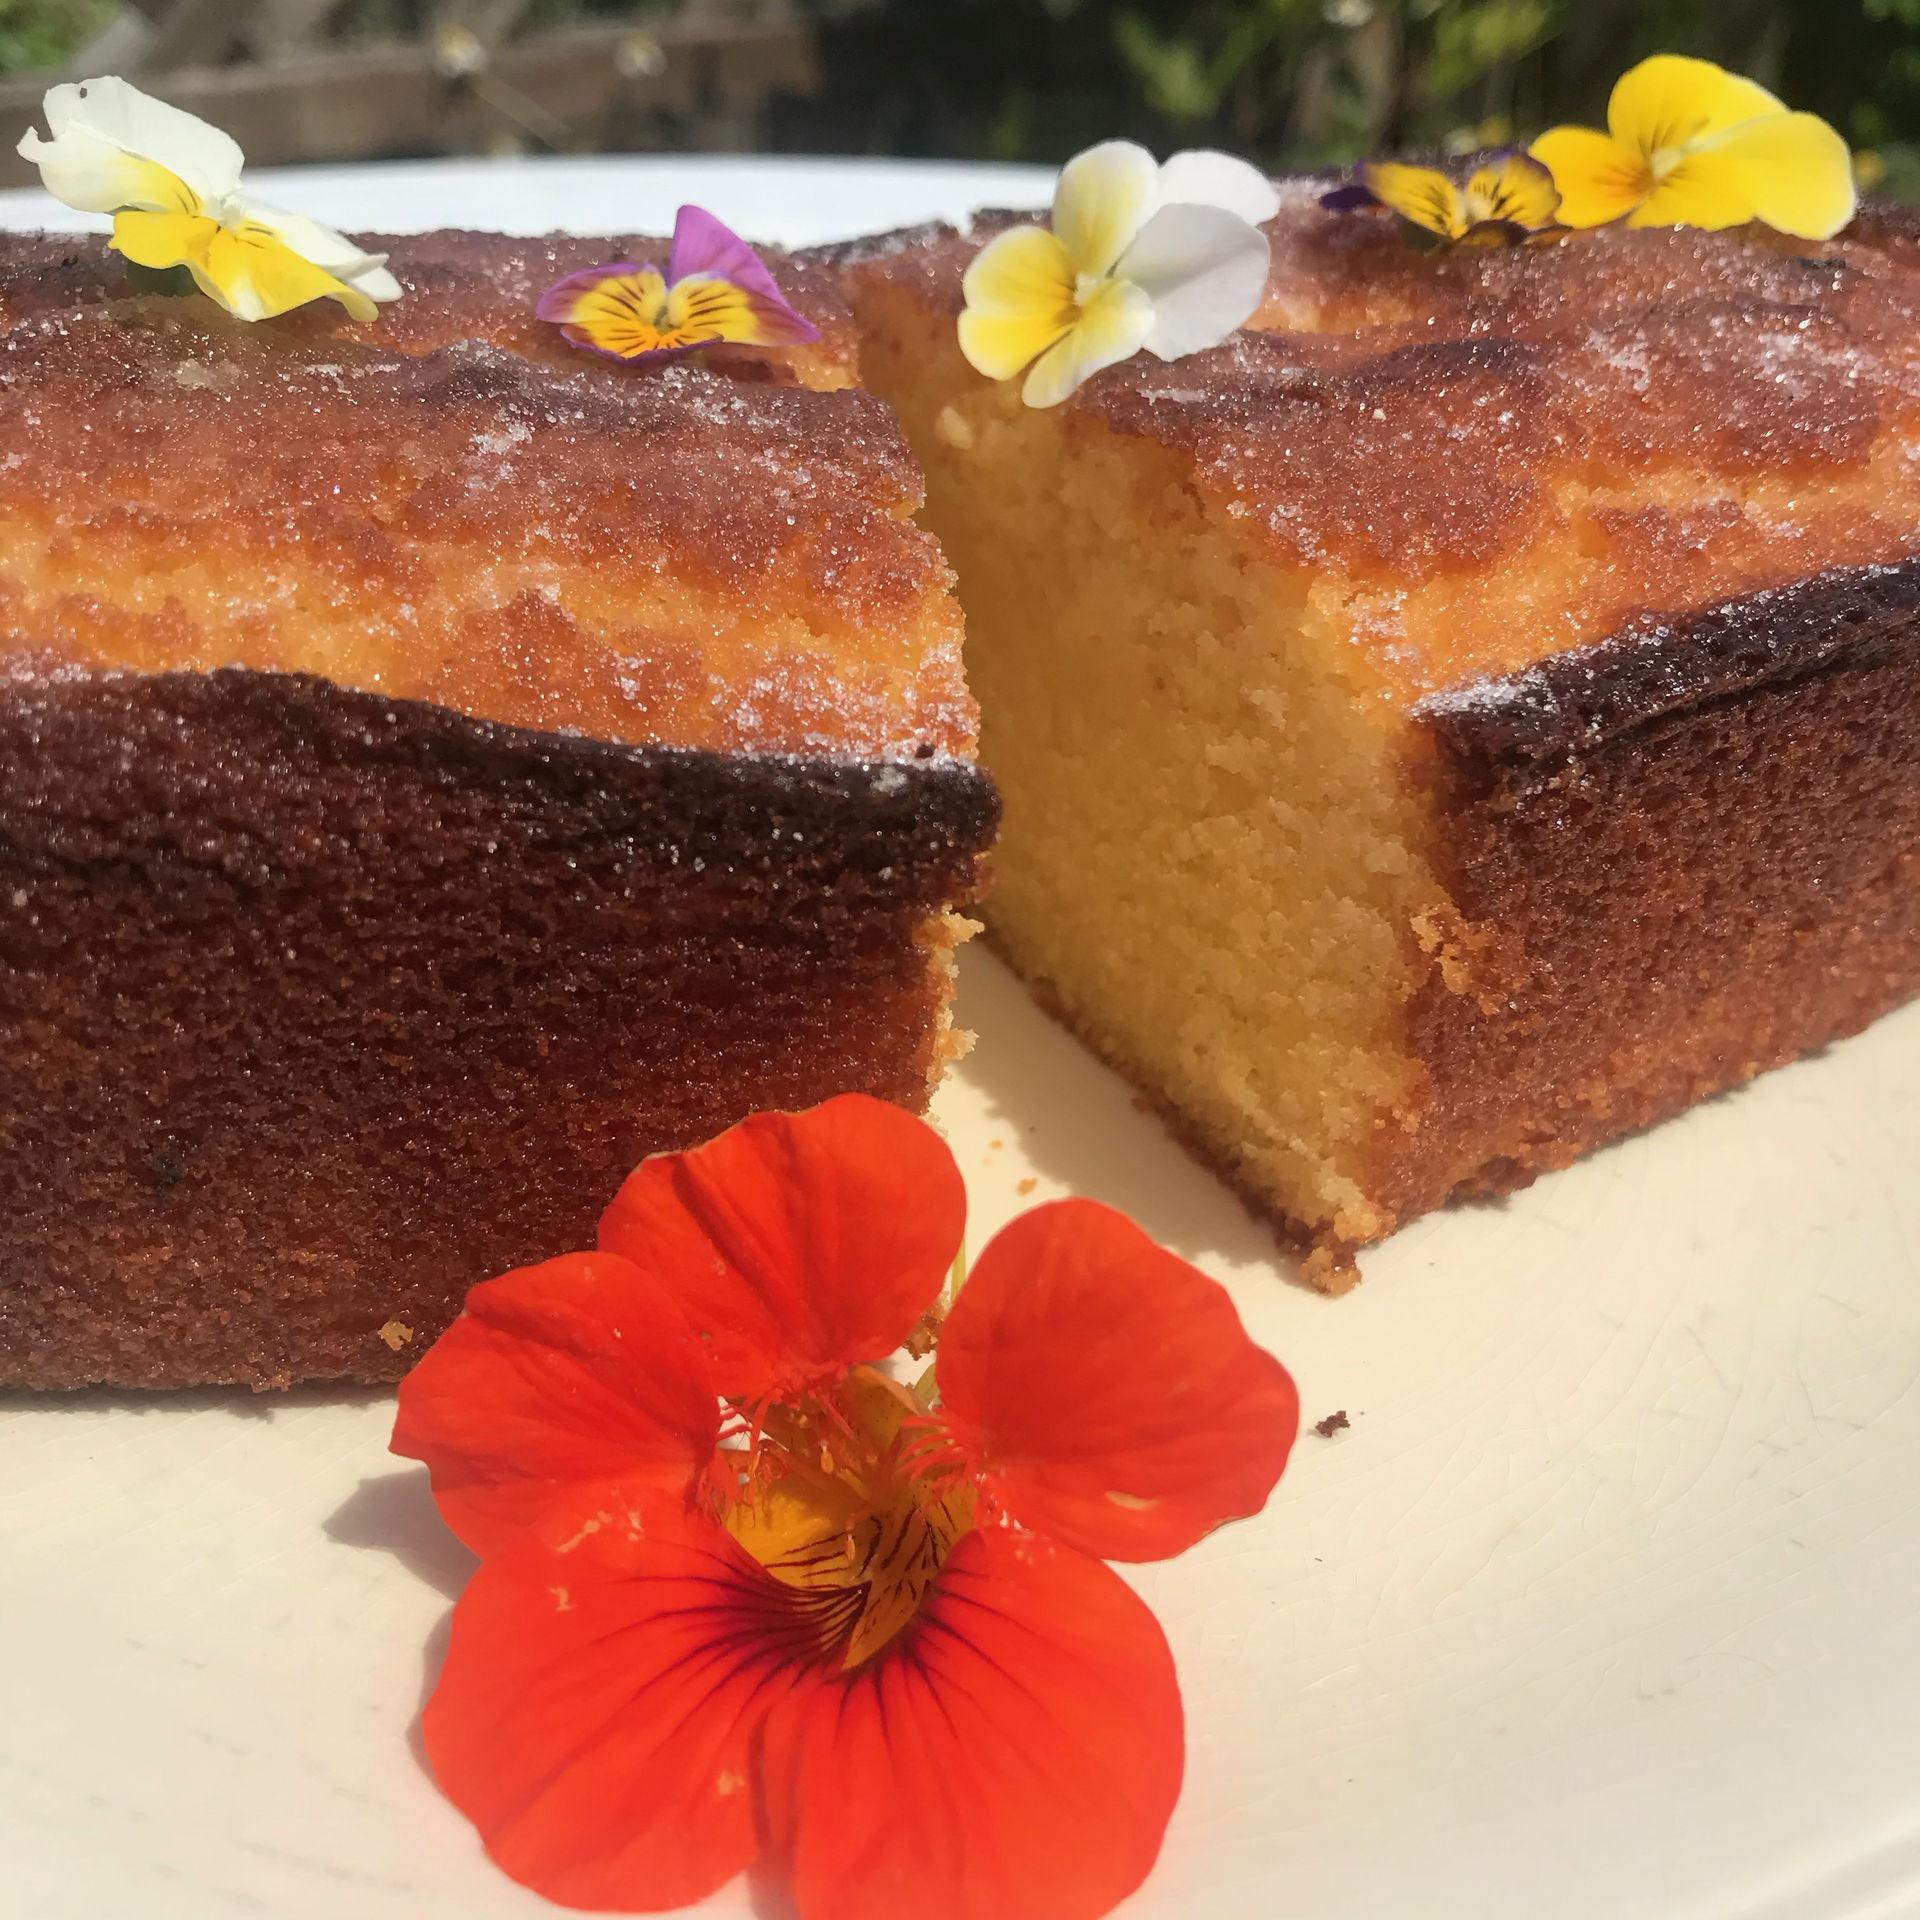 zero-waste-recipe-lemon-dandelion-syrup-drizzle-cake-img-0360.jpg